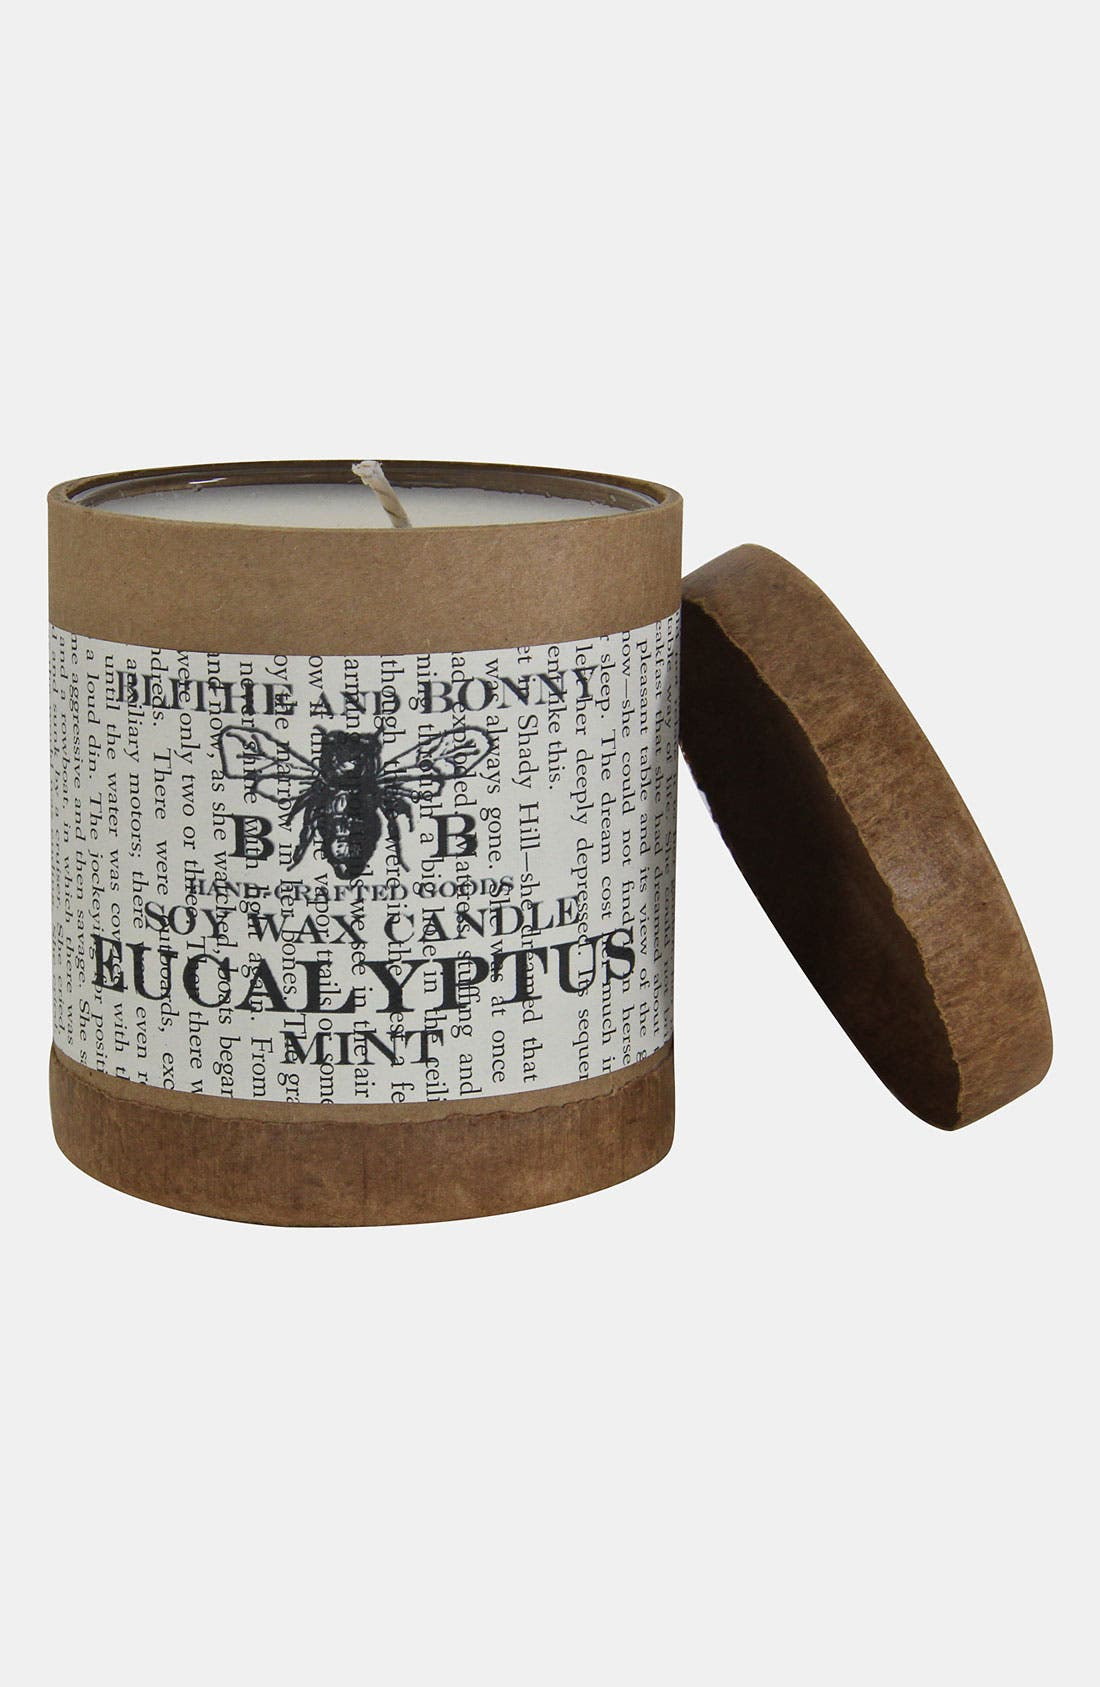 Main Image - Blithe and Bonny Eucalyptus Soy Candle